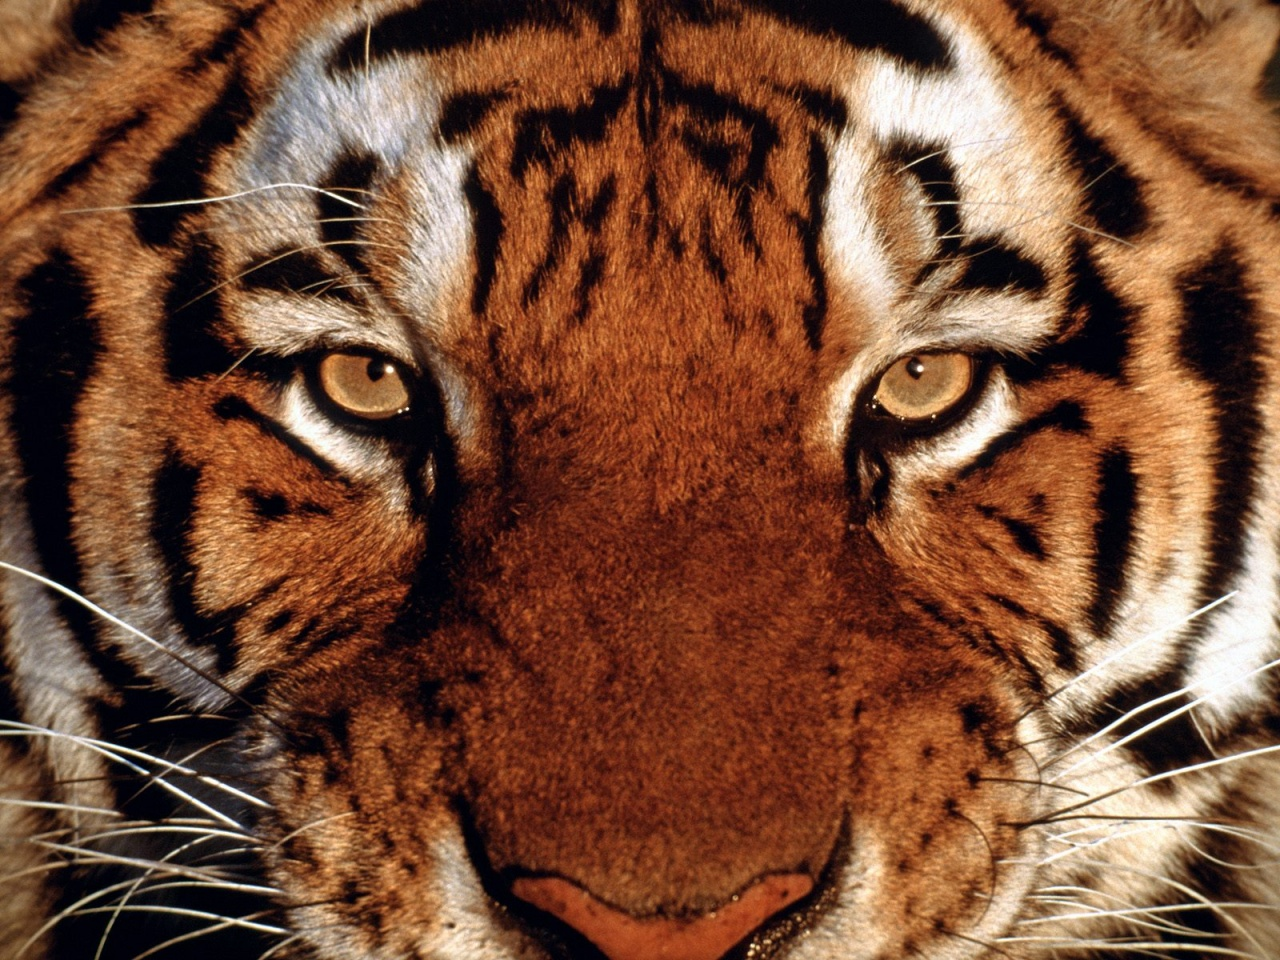 1280x960 Tiger Portrait Desktop Pc And Mac Wallpaper Pictures 1280x960